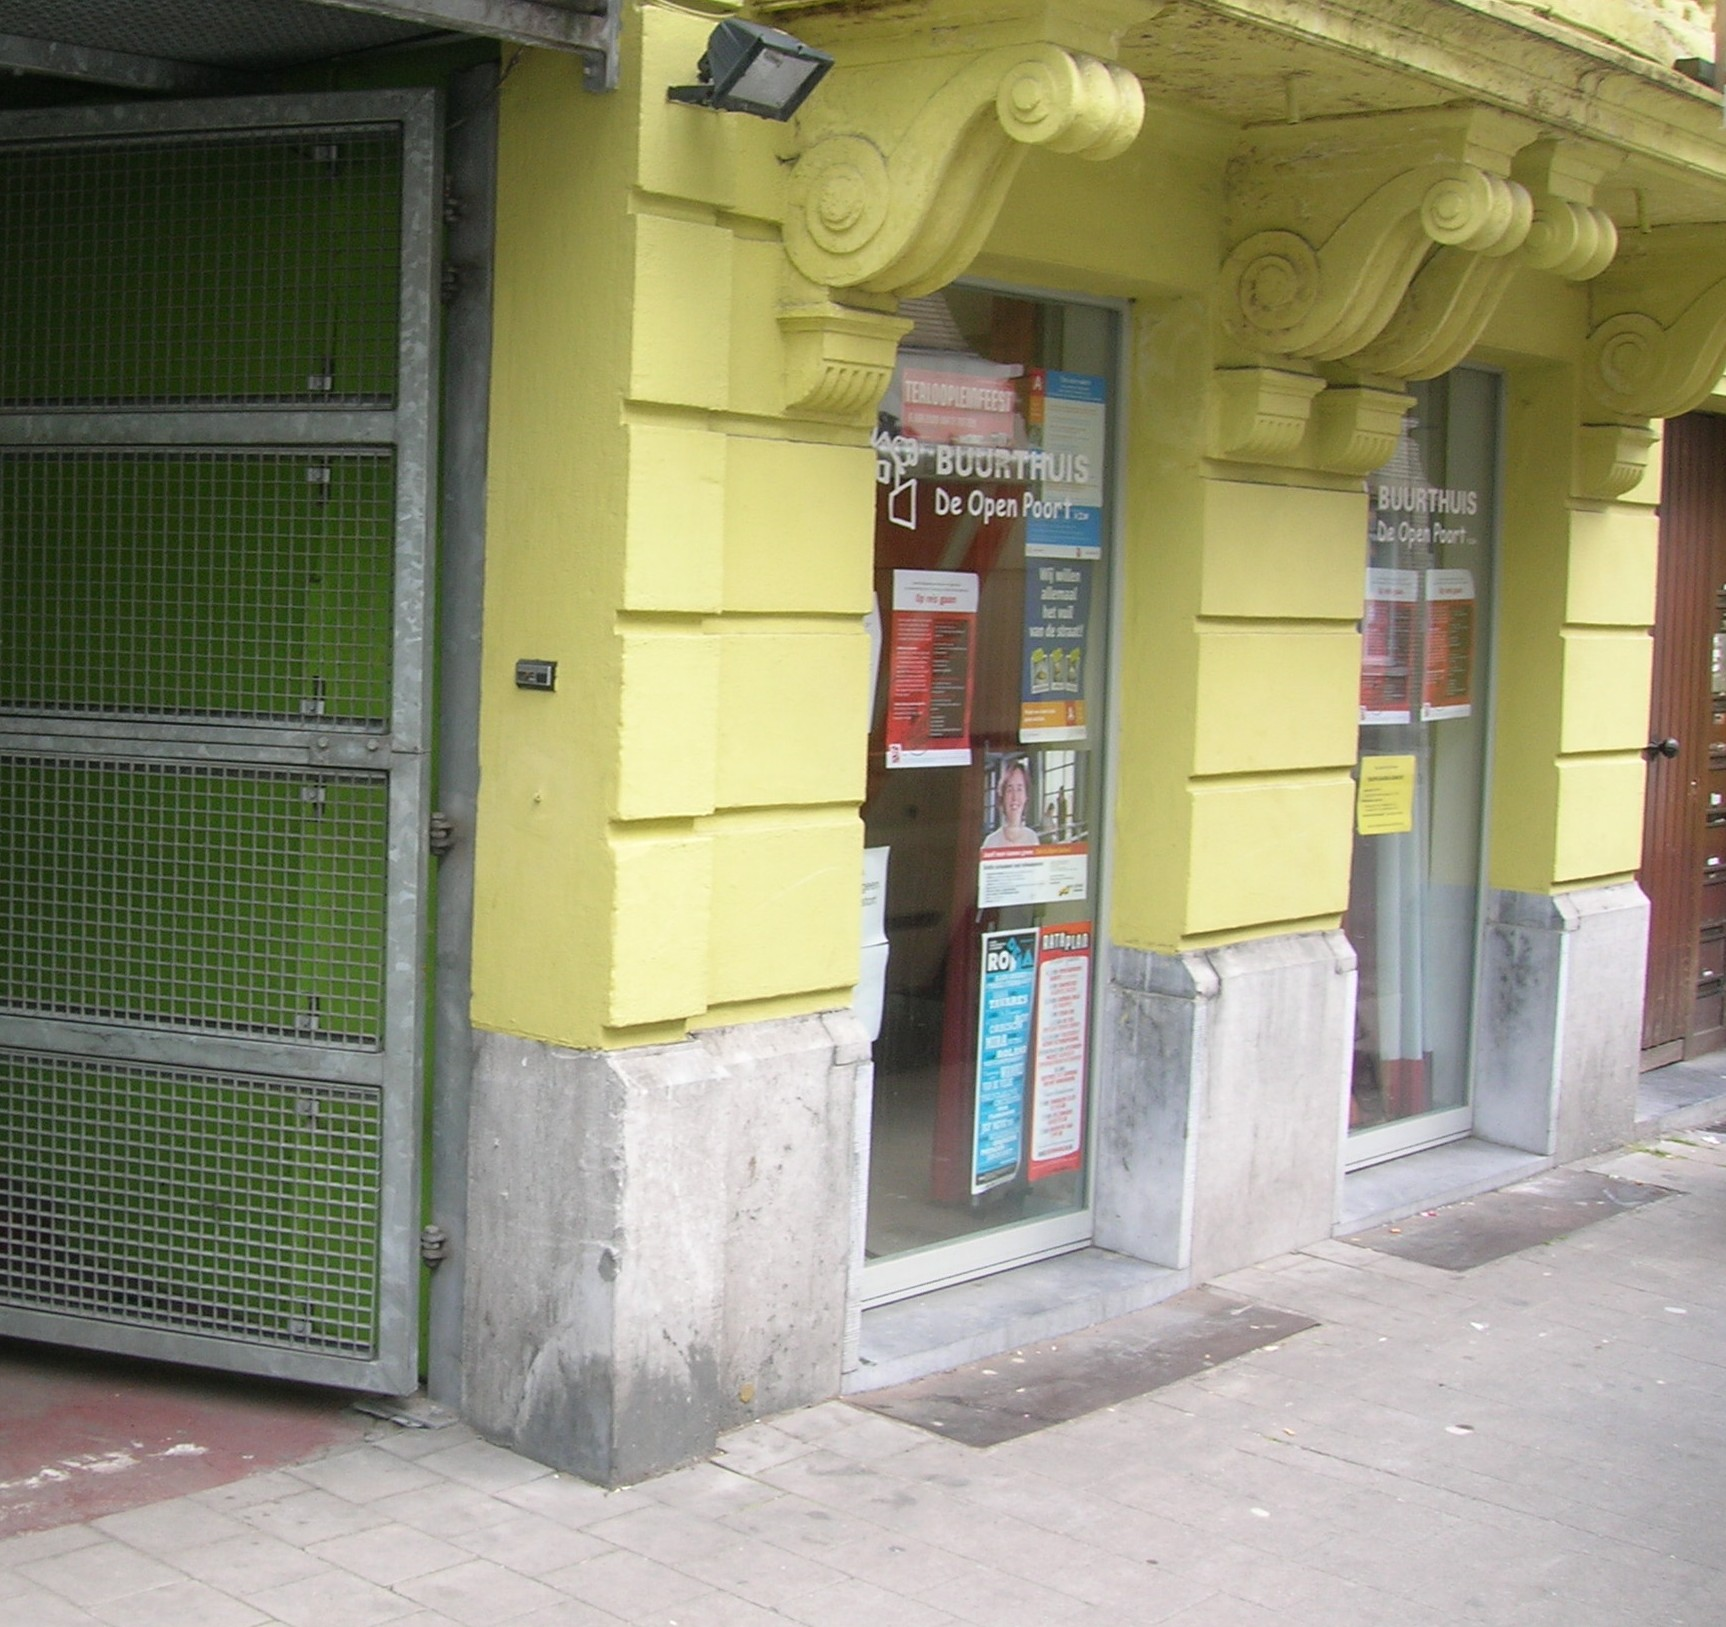 Buurthuis De Shelter